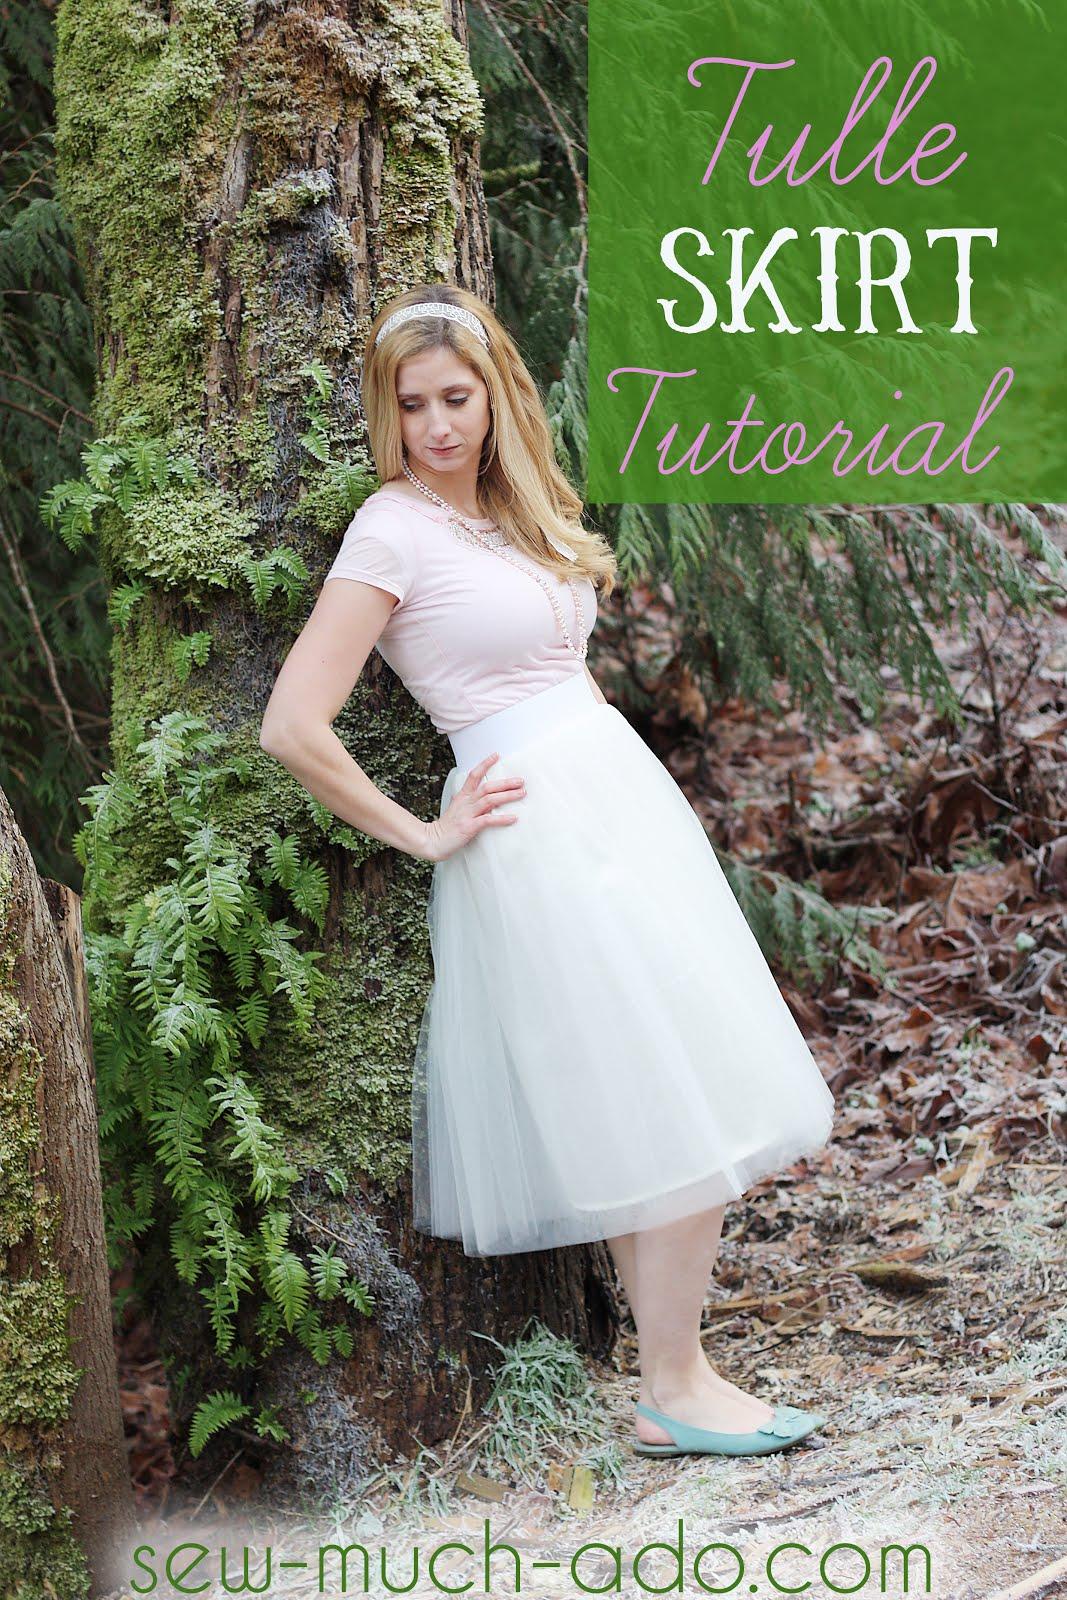 Tulle Skirt Tutorial - Sew Much Ado